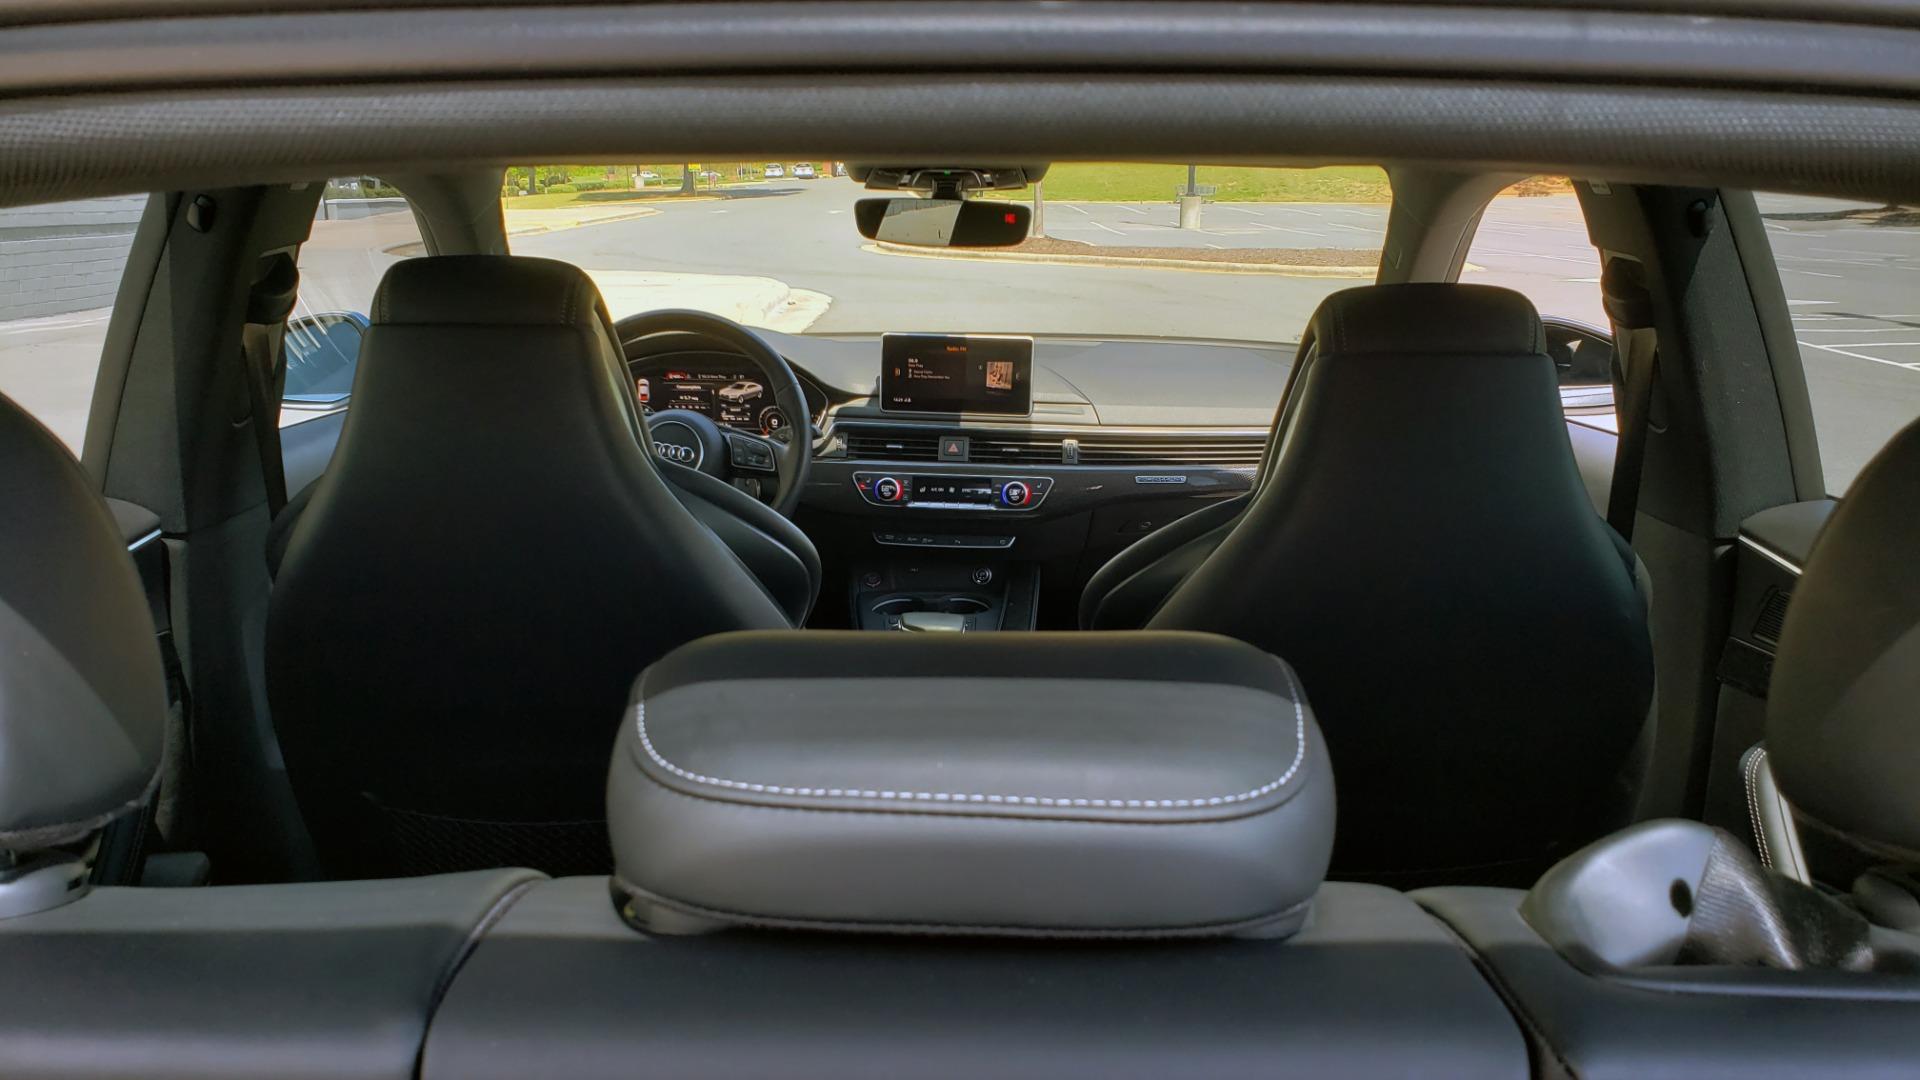 Used 2018 Audi S5 SPORTBACK PRESTIGE S-SPORT / NAV / SUNROOF / HUD / B&O SND / REARVIEW for sale $48,995 at Formula Imports in Charlotte NC 28227 18